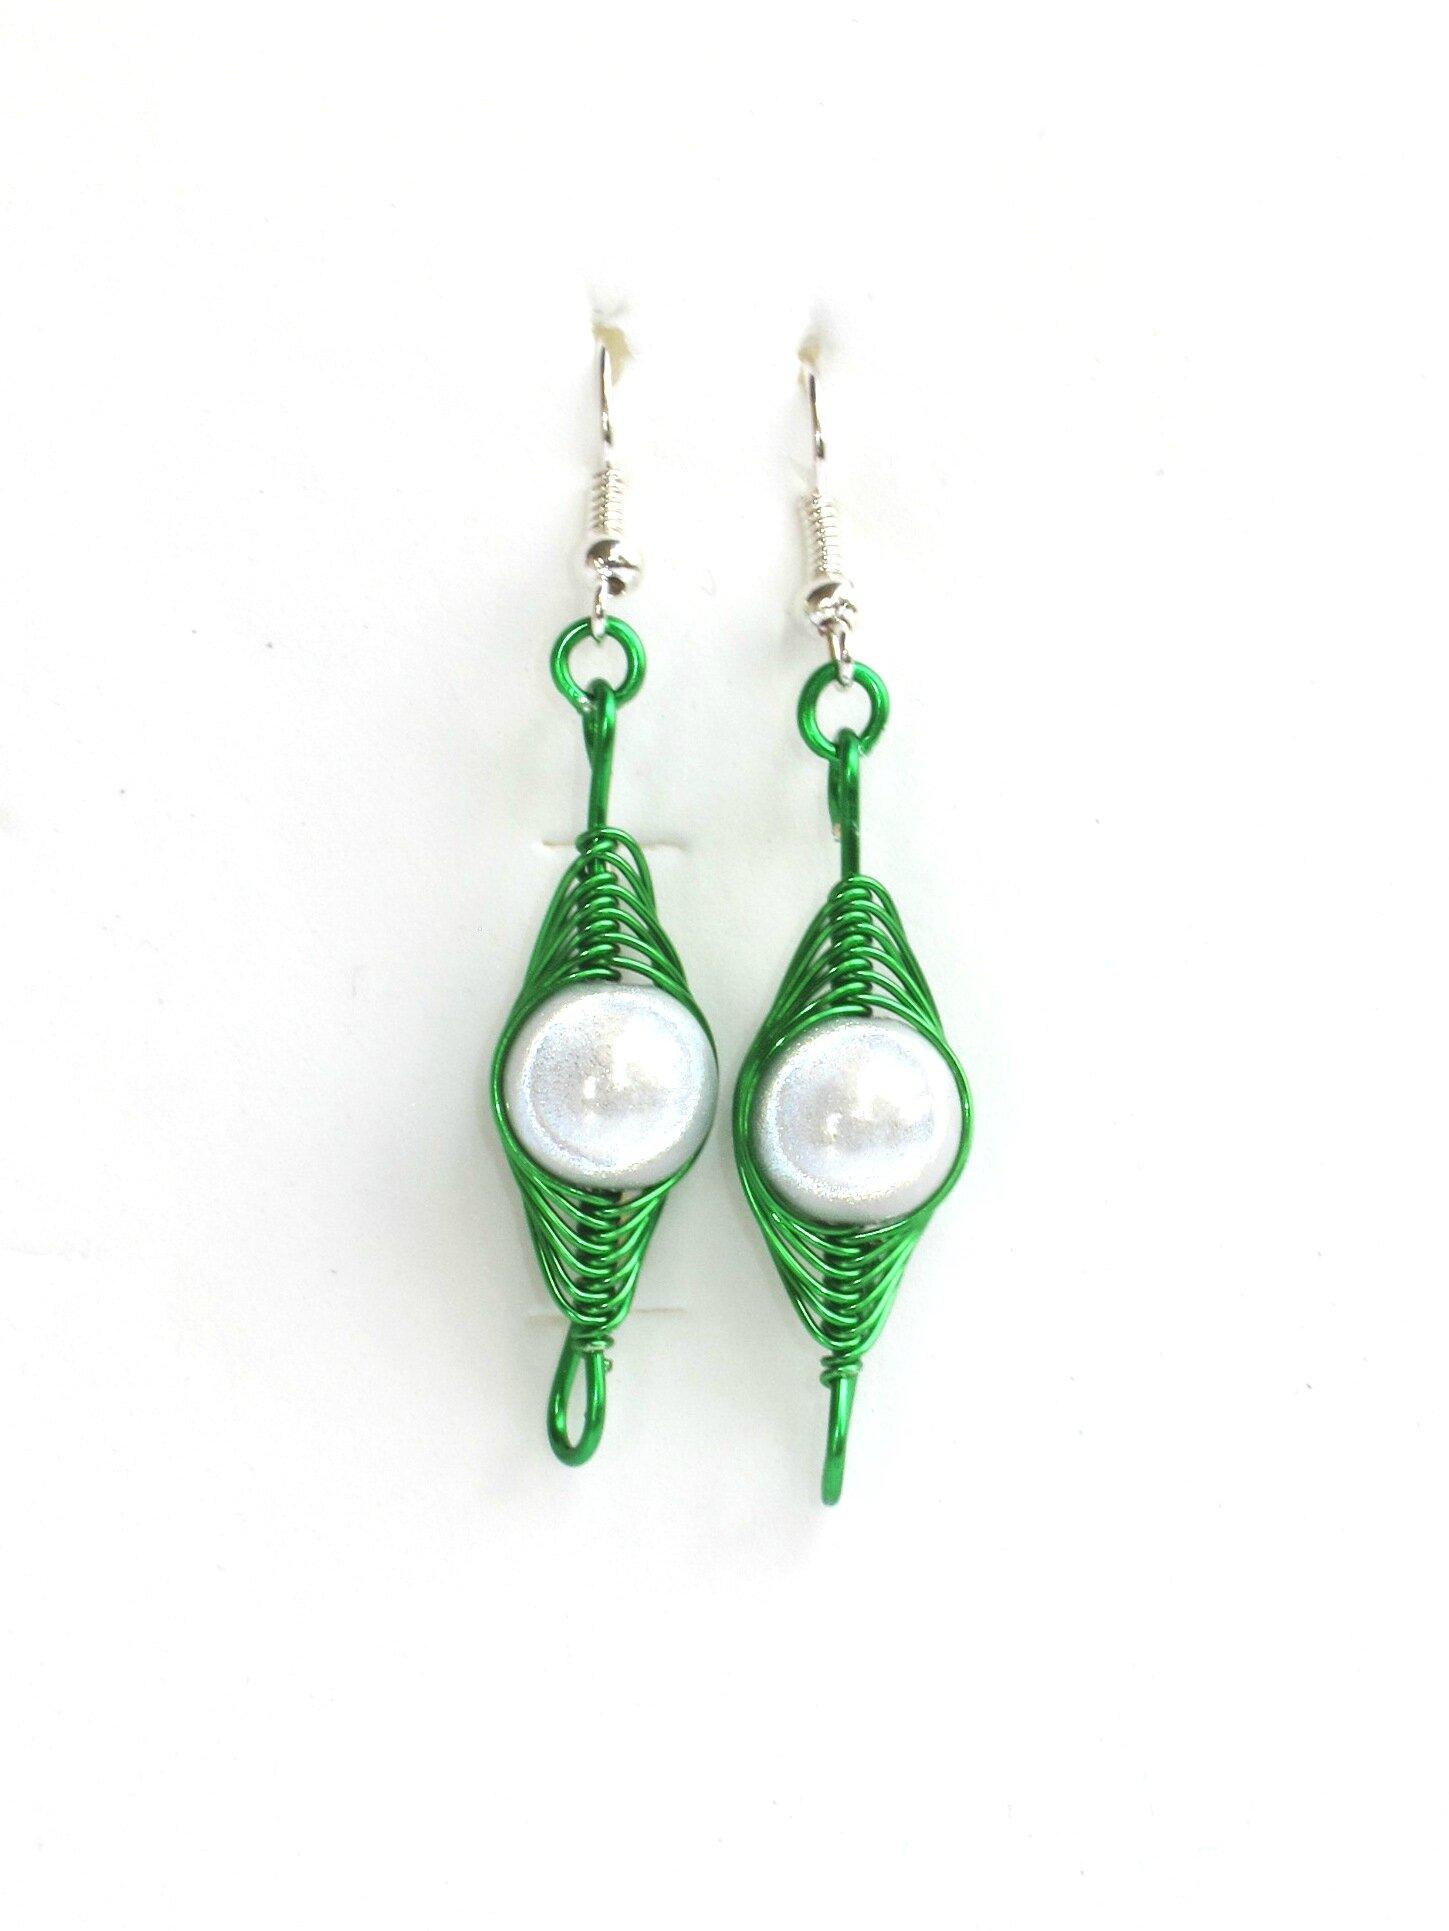 boucles d'oreilles wire verte perles blanches face